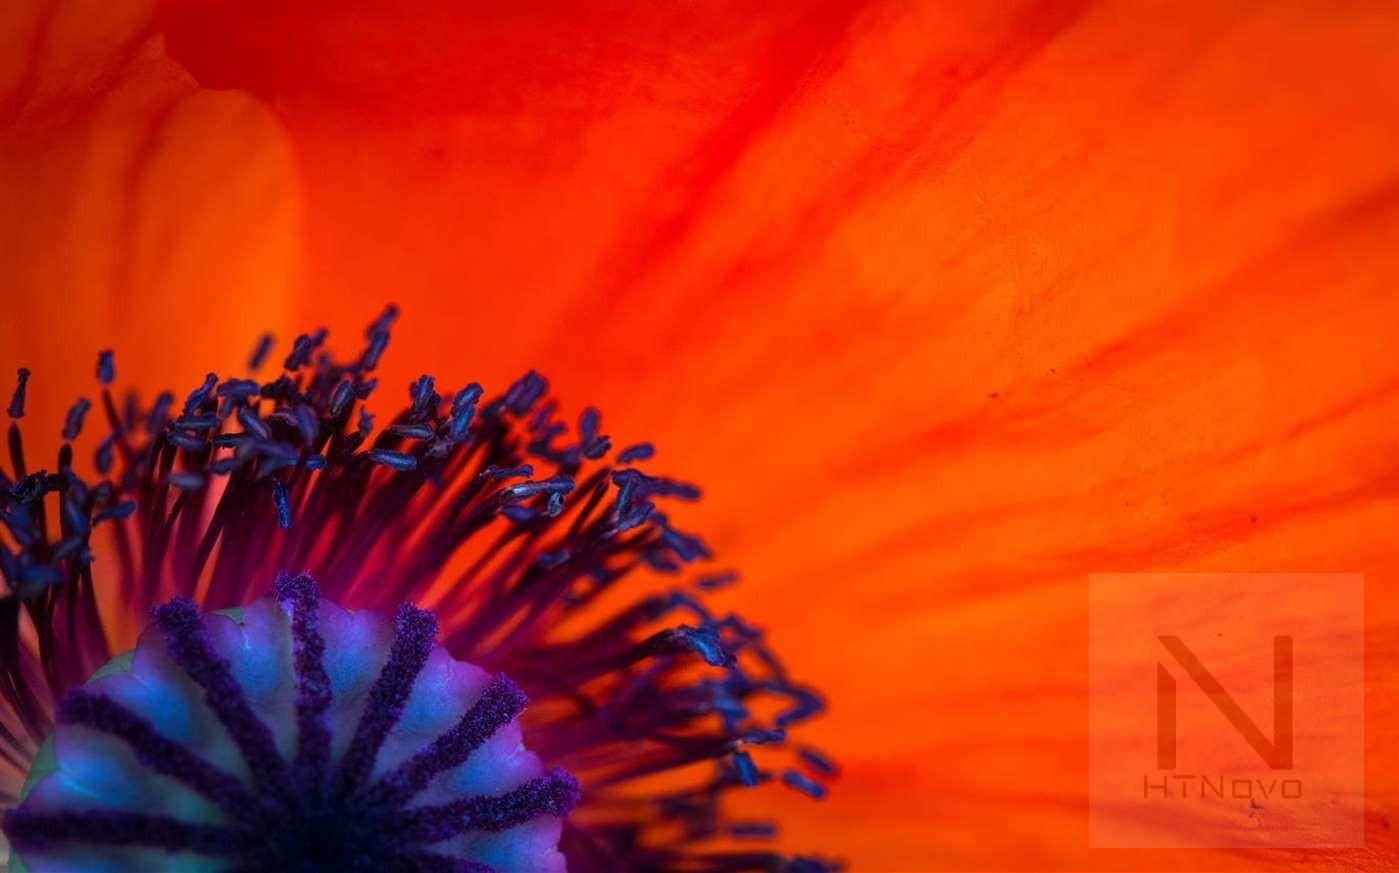 Download-Field-of-Poppies-Tema-Windows-10